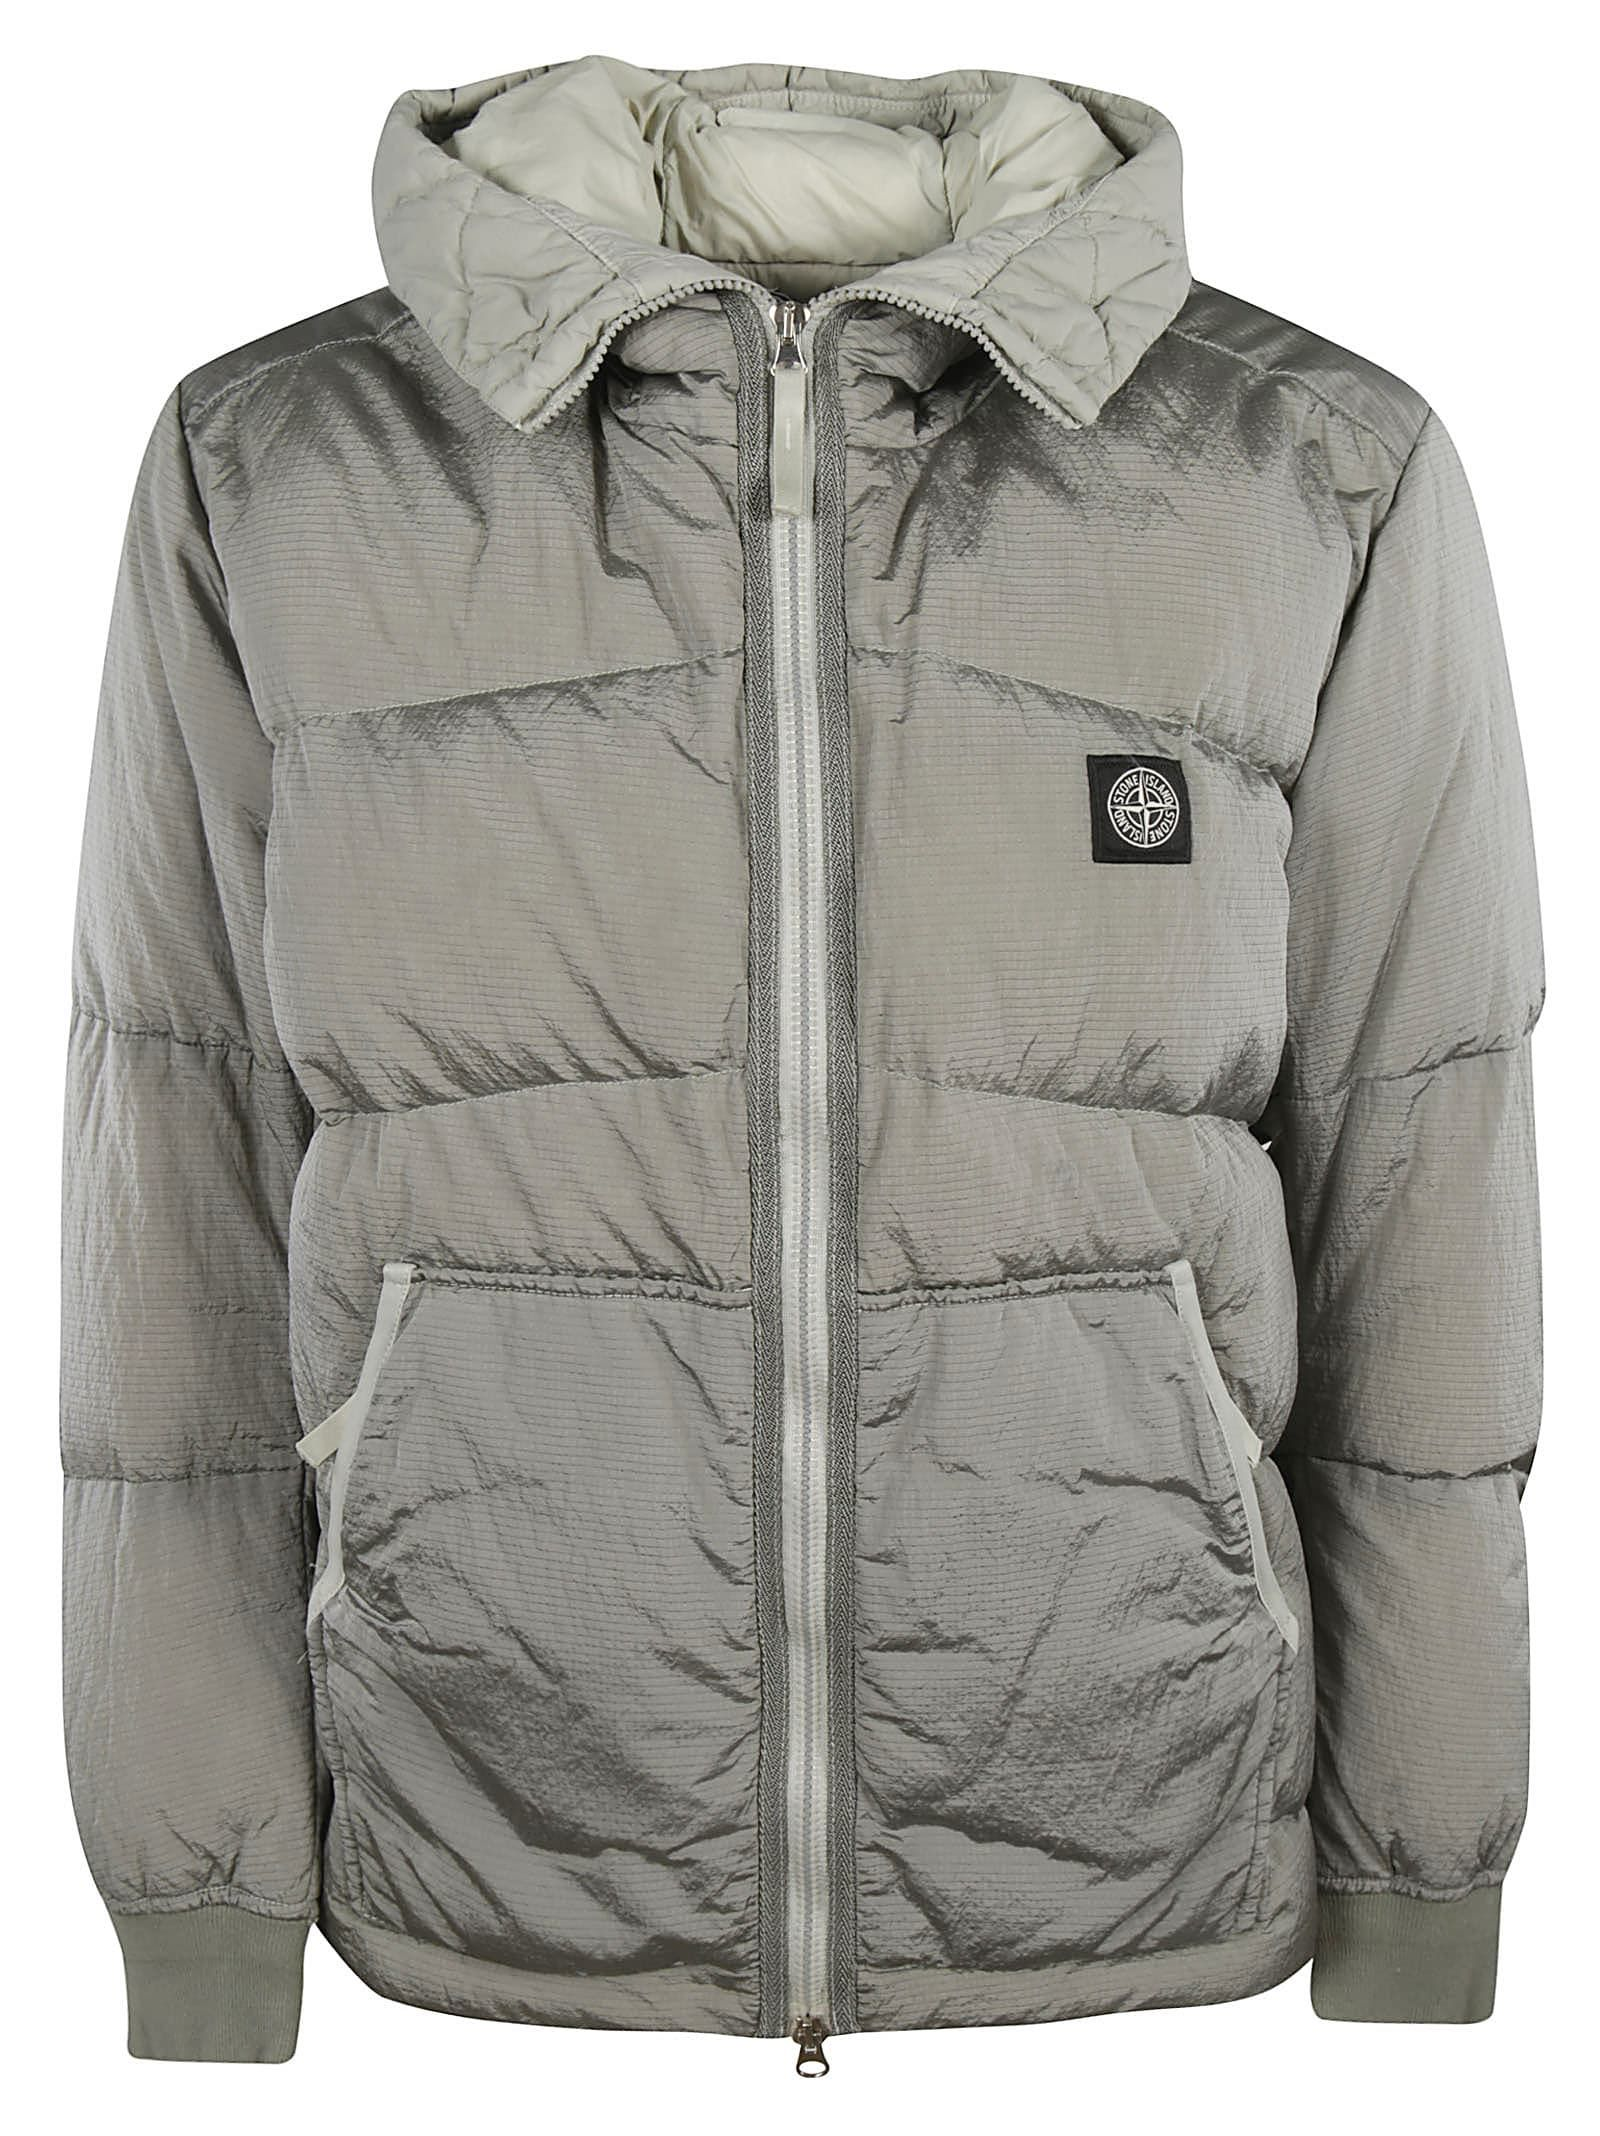 Stone Island Logo Patch Down Jacket In Light Grey Modesens Down Jacket Padded Jacket Jackets [ 2136 x 1600 Pixel ]